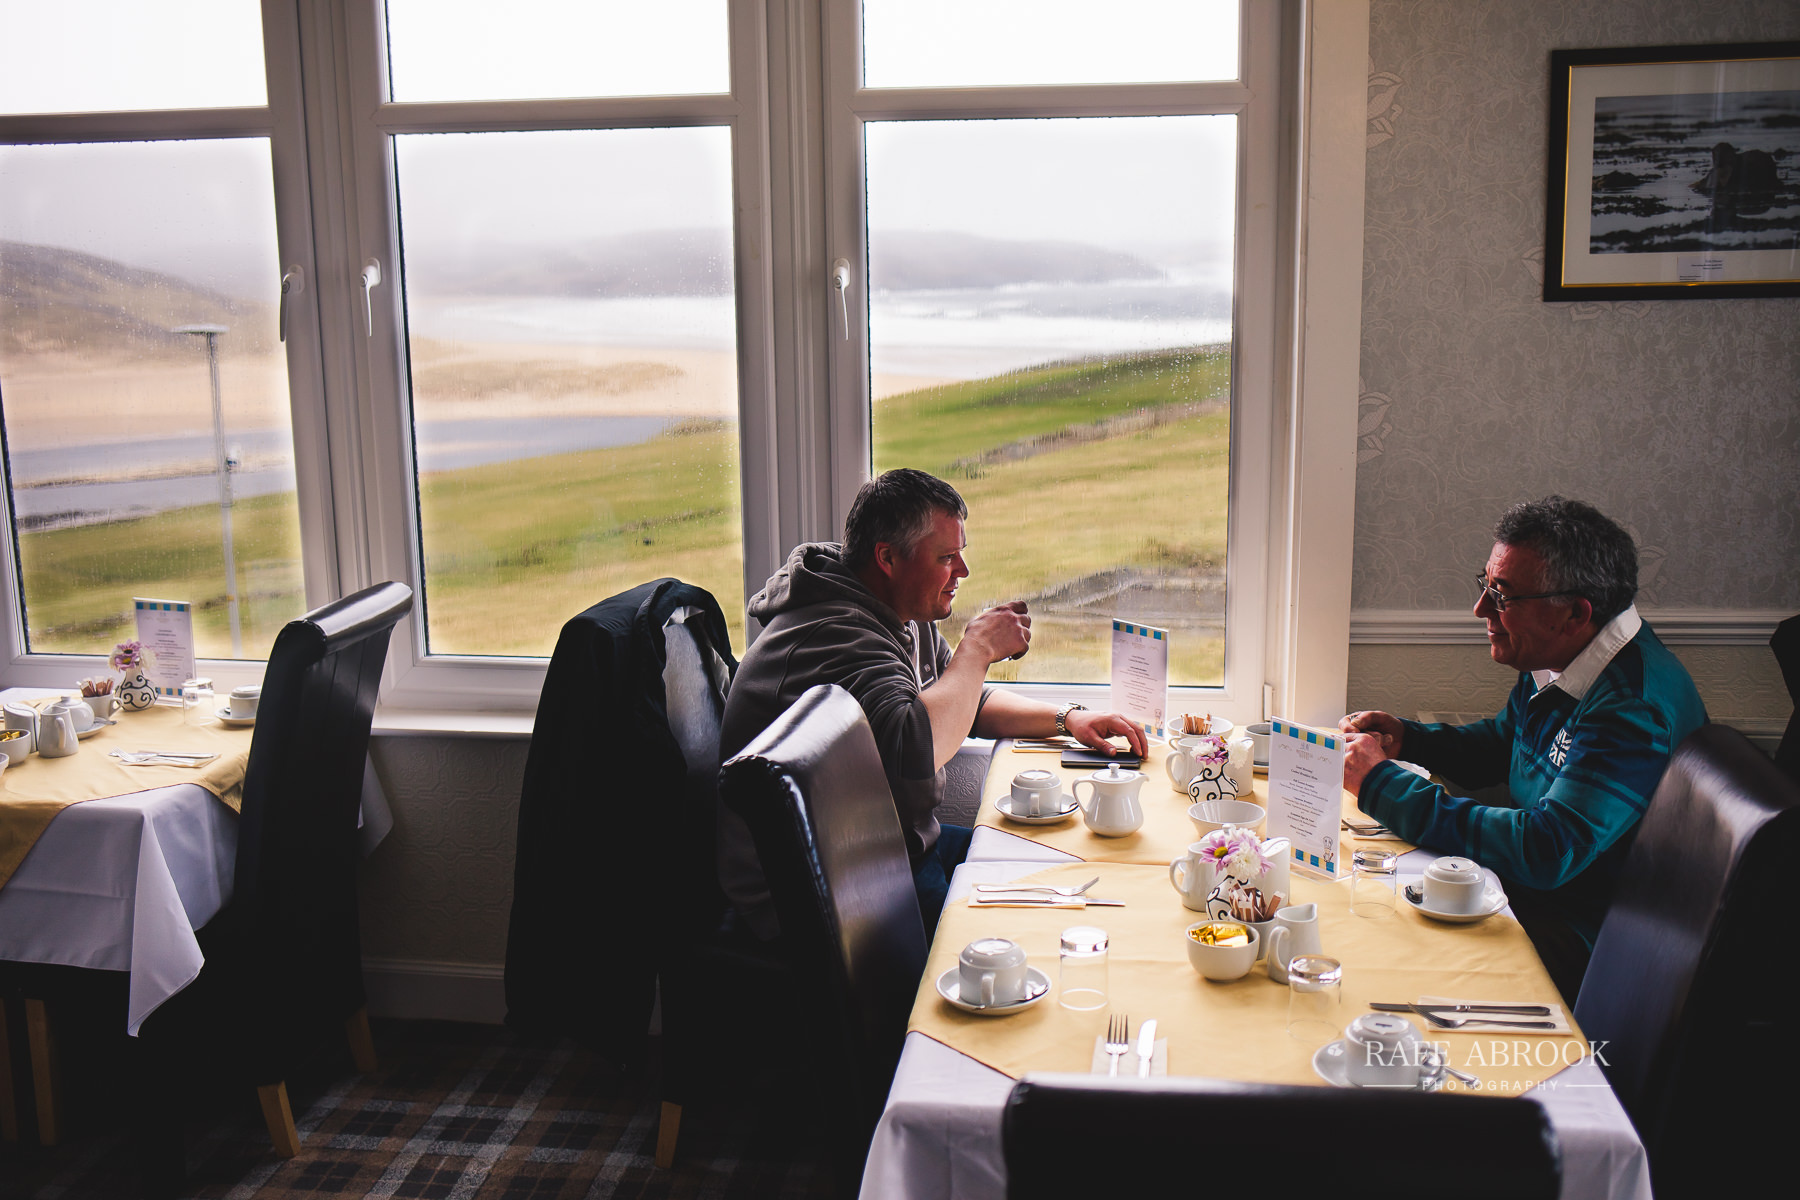 north coast 500 scotland porsche cayman gt4 golf r estate rafe abrook photography-1120.jpg